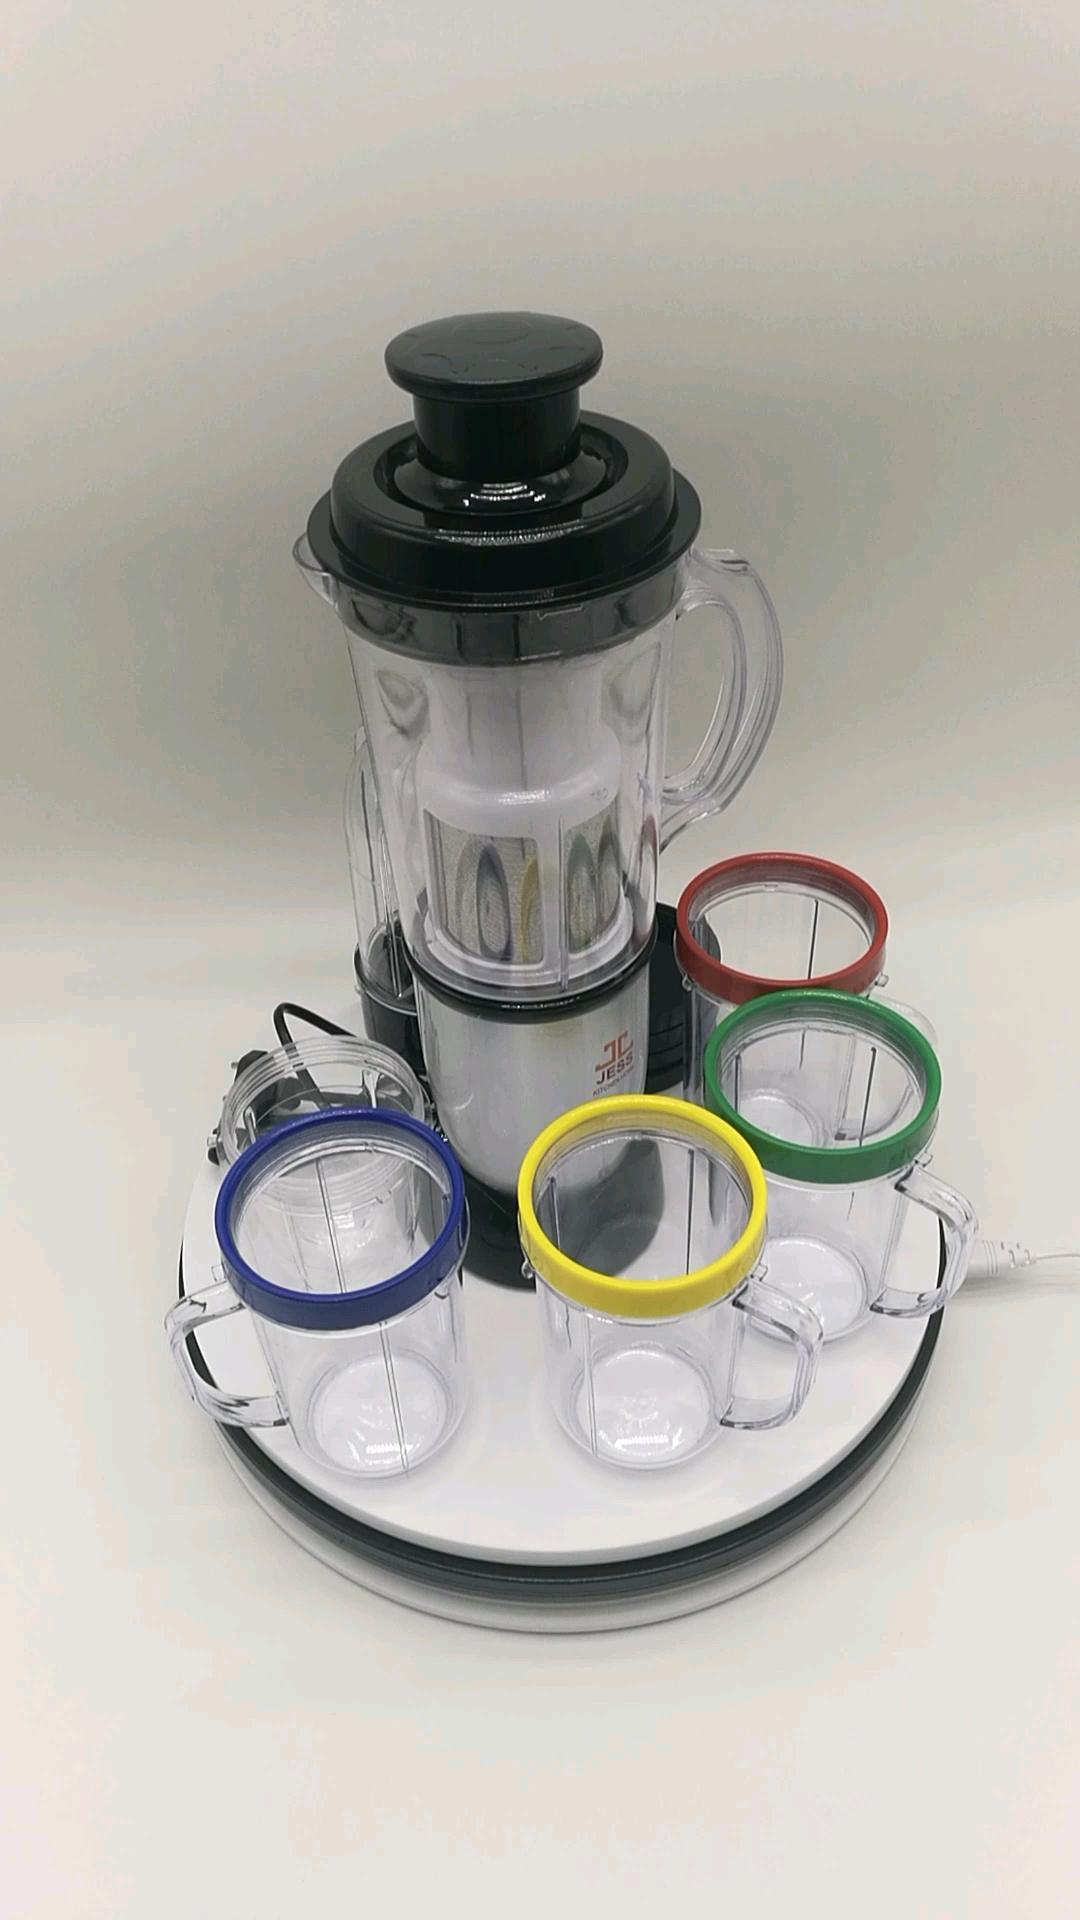 10 Stuk Smoothie Blender Machine Om Vruchtensap Schoonheid Blenders